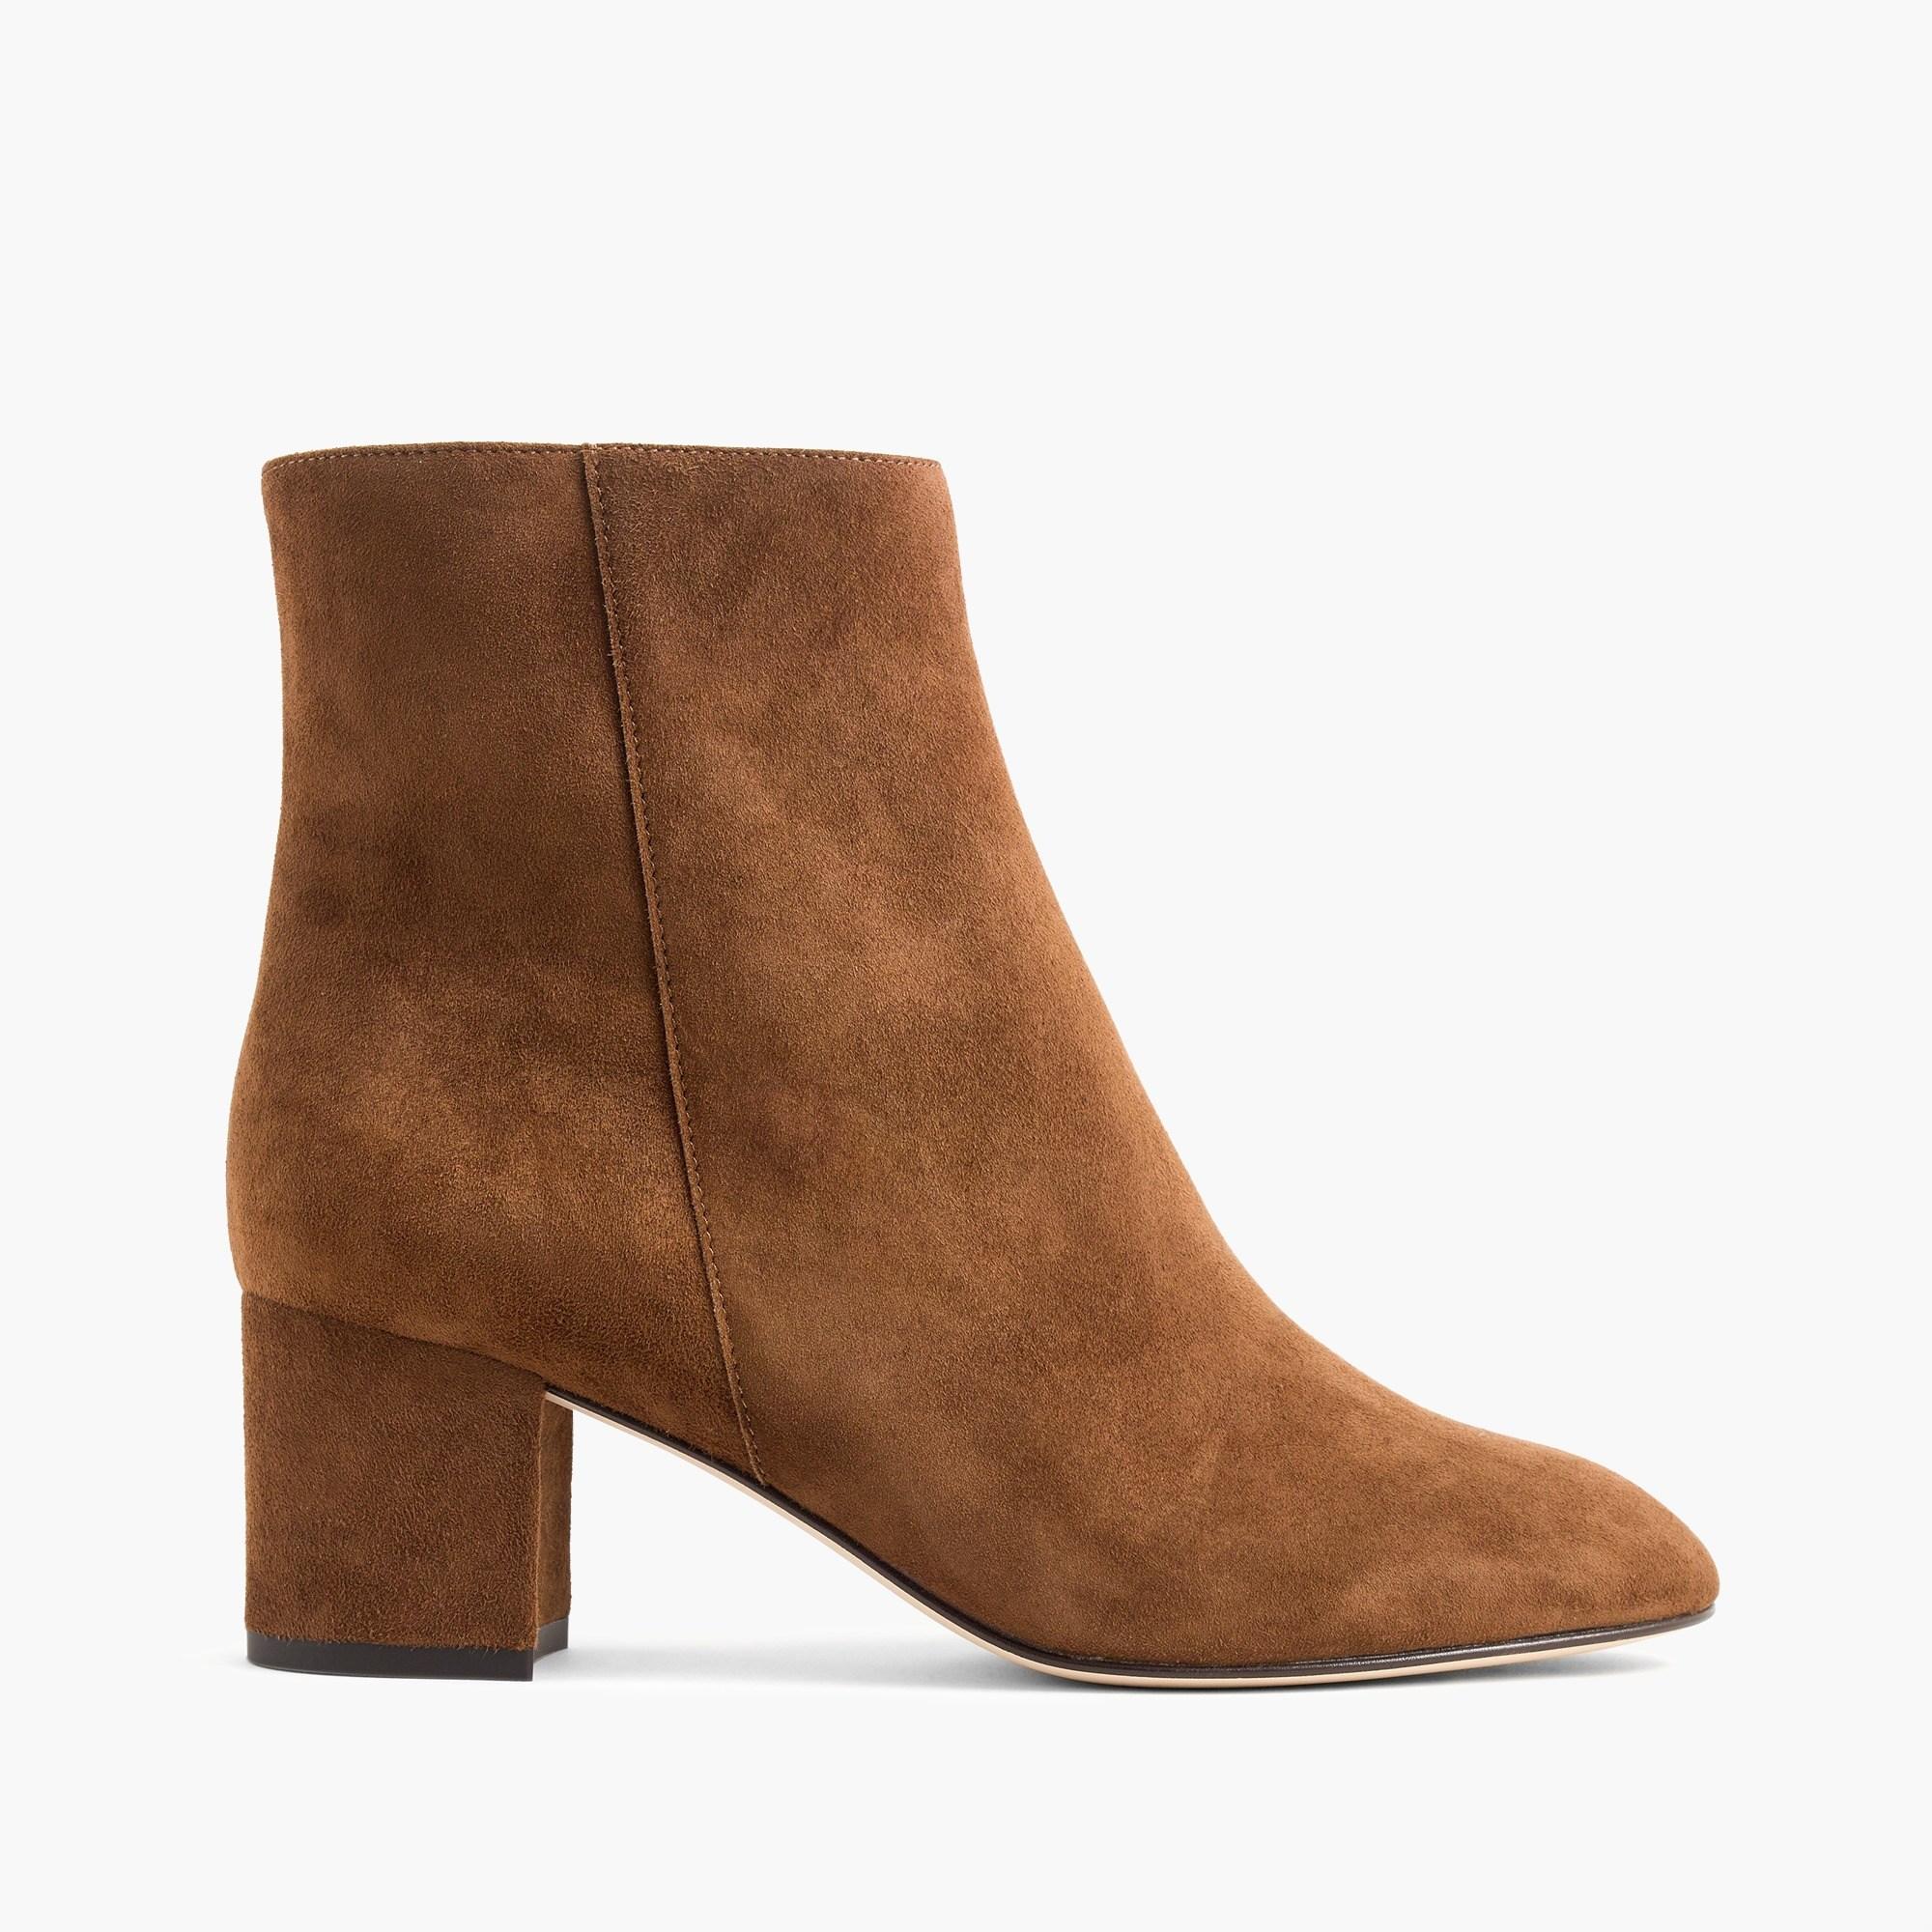 Hadley suede boots : | J.Crew